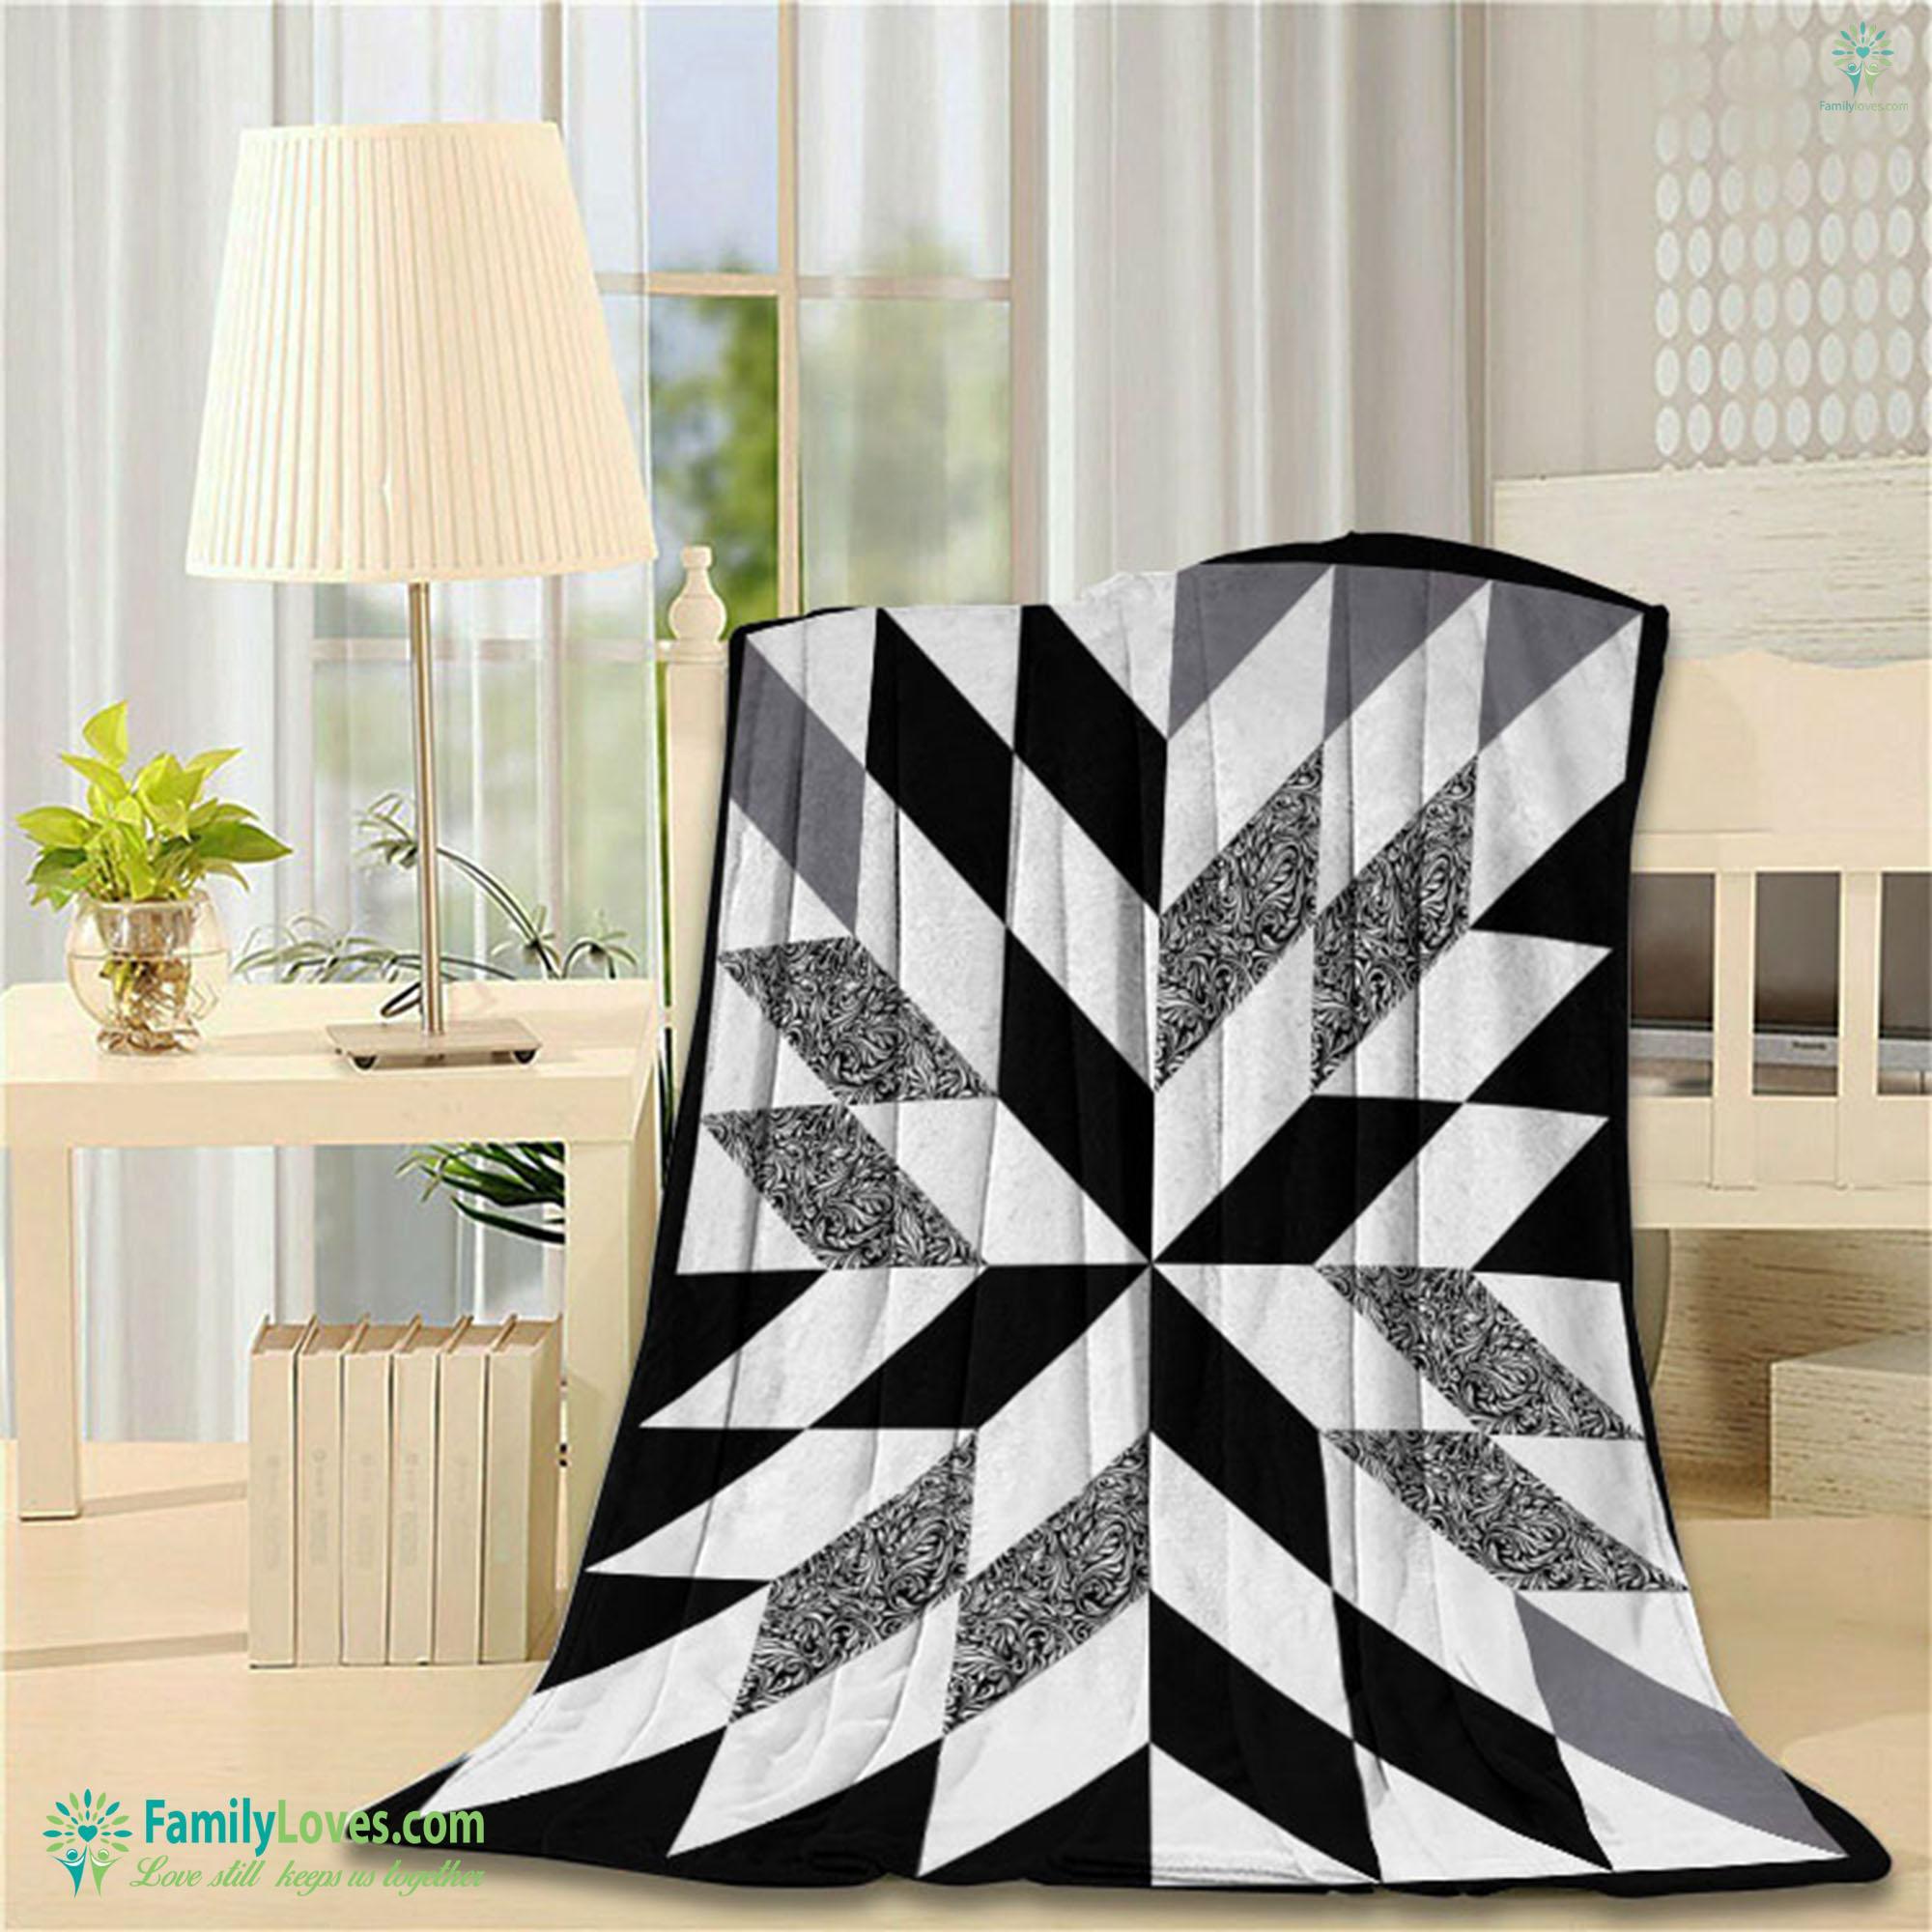 Half Square Triangle Blanket 10 Familyloves.com